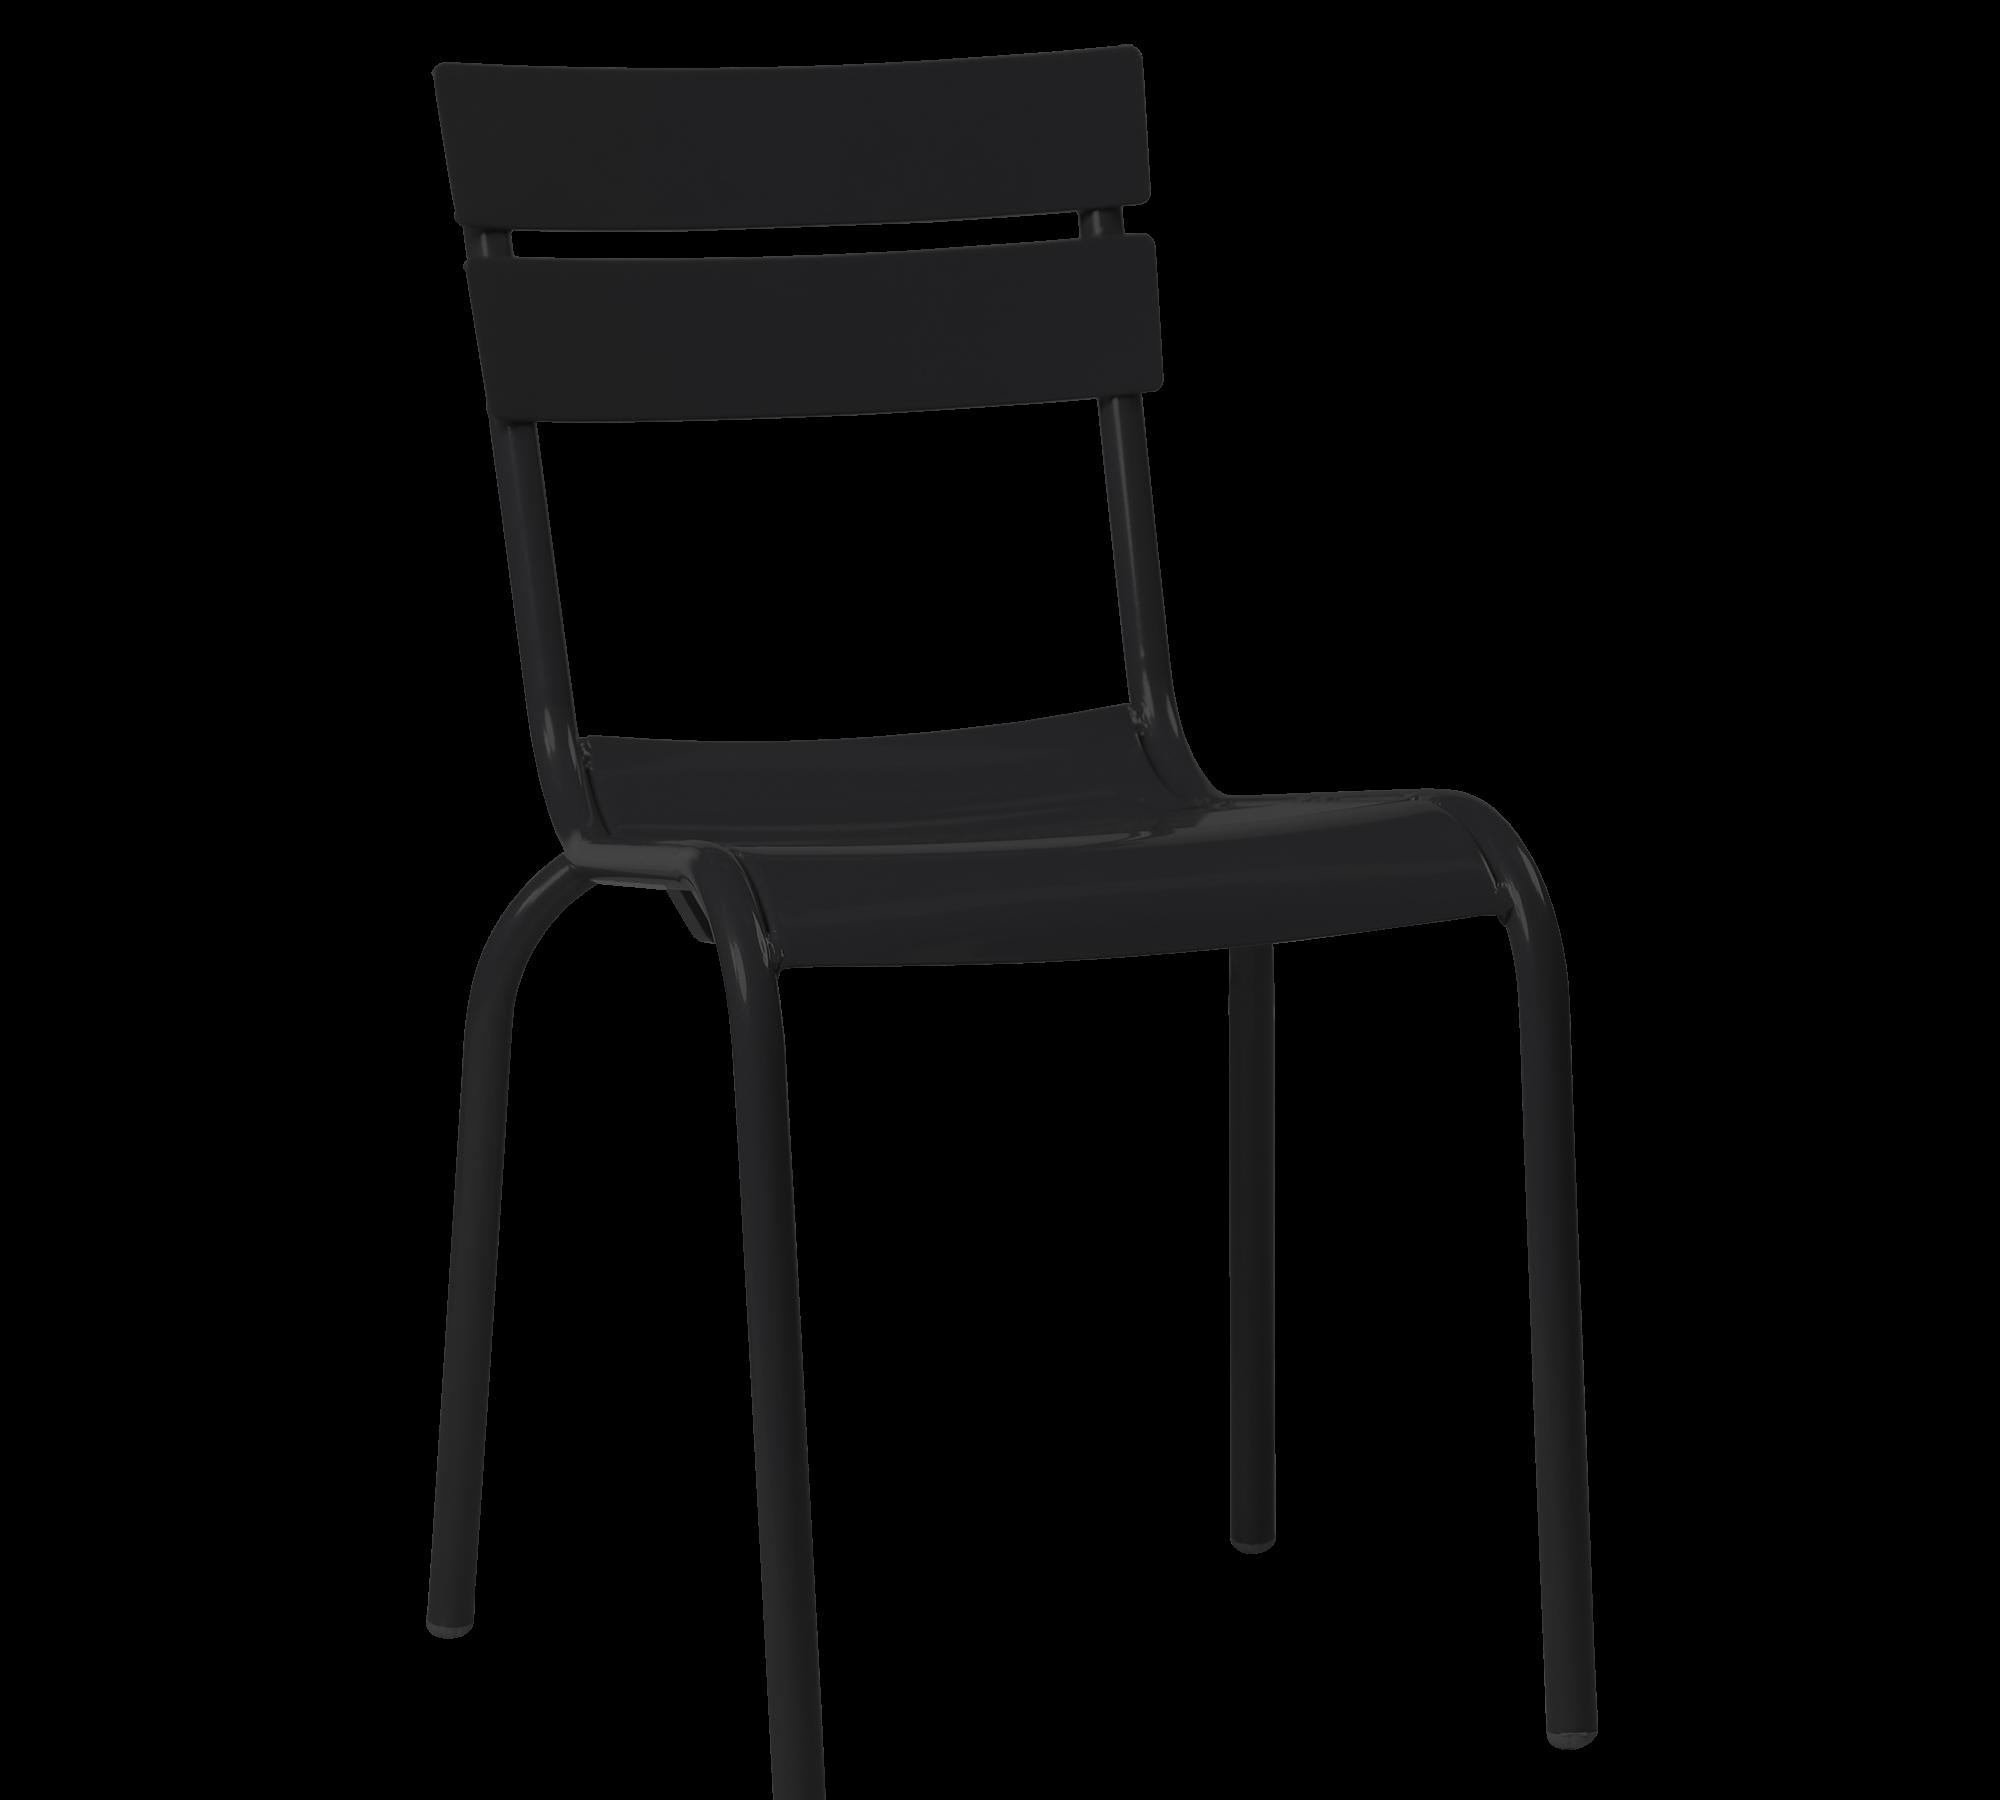 porto chair black